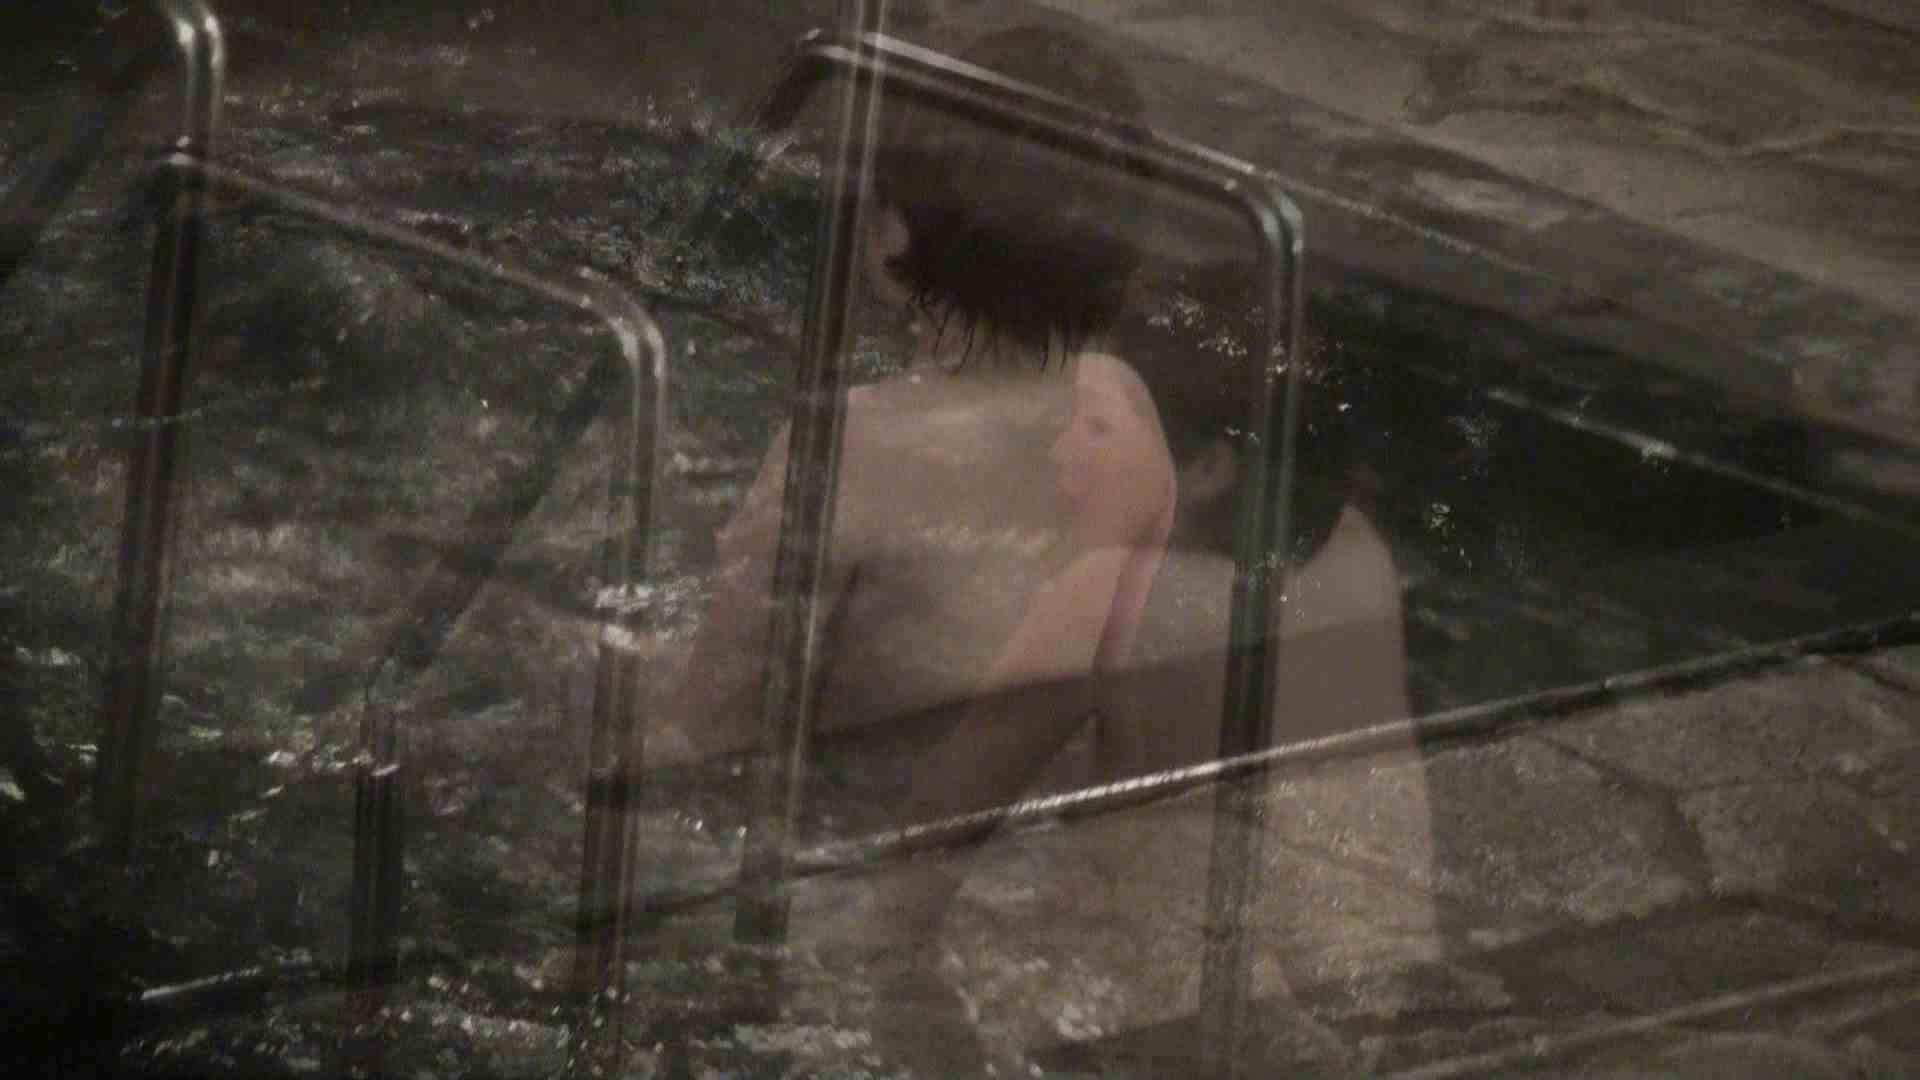 Aquaな露天風呂Vol.432 HなOL AV無料動画キャプチャ 111pic 57